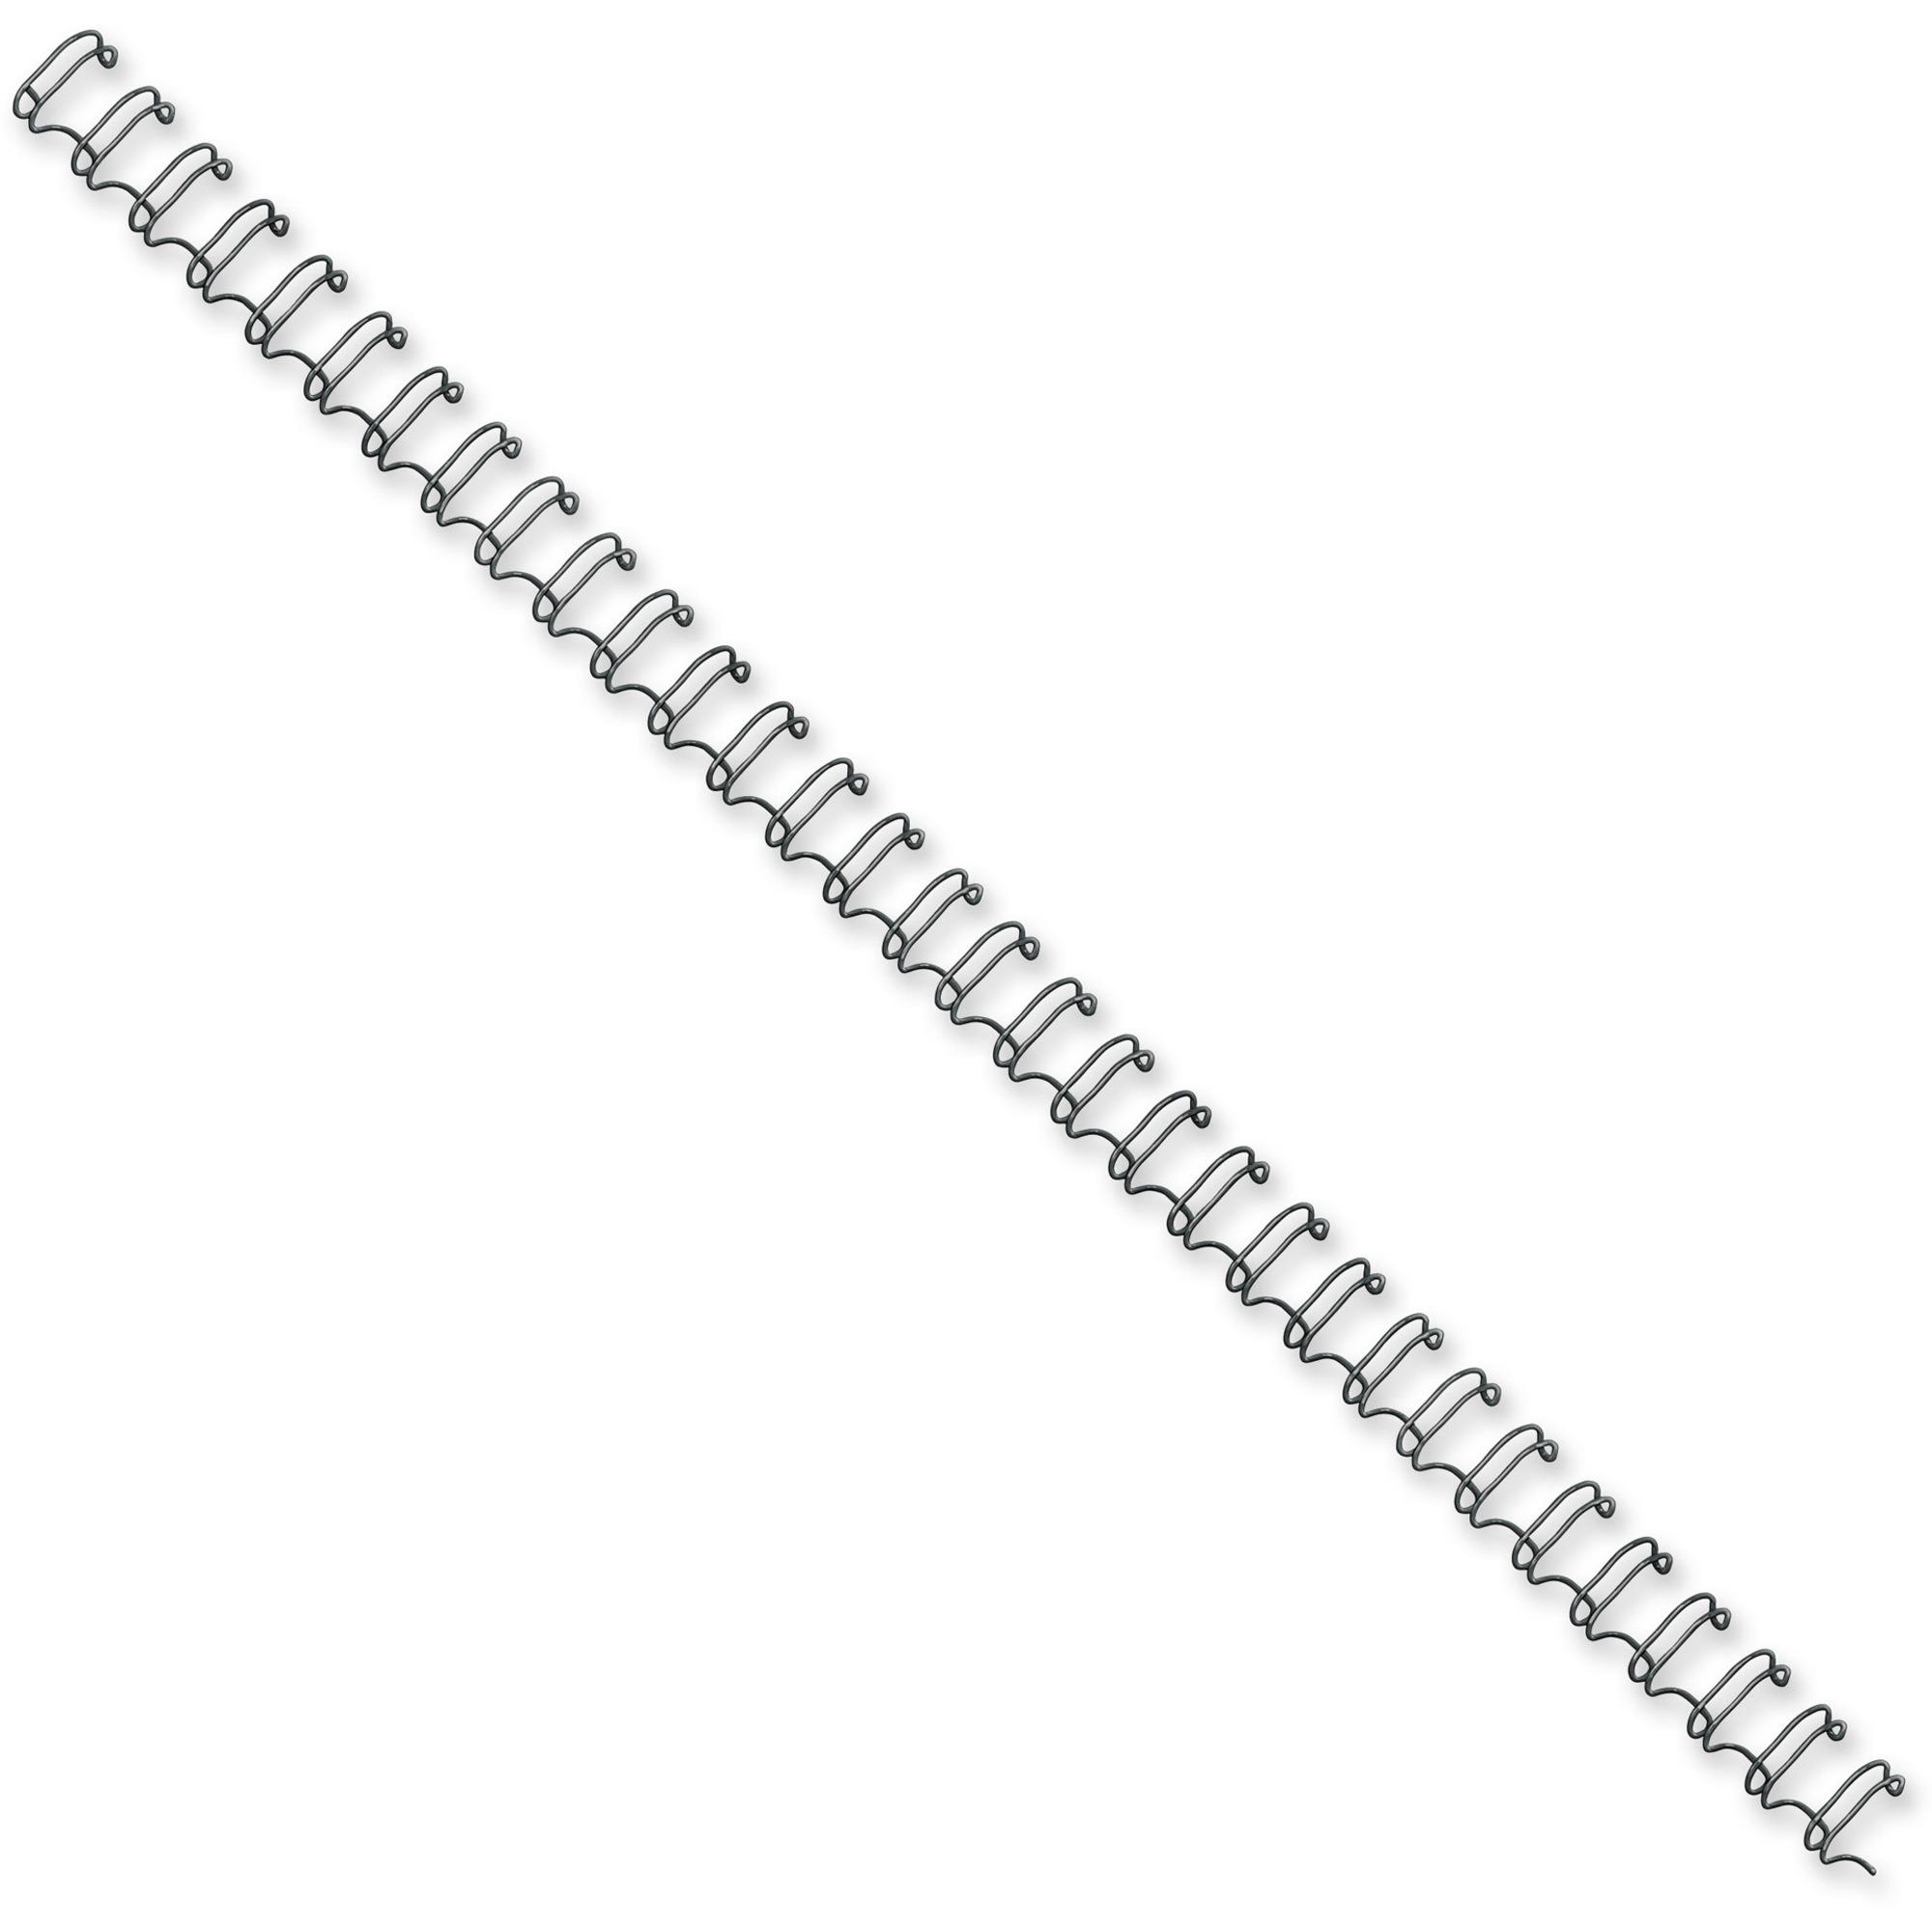 Fellowes Double Loop Wire Binding Combs Fel